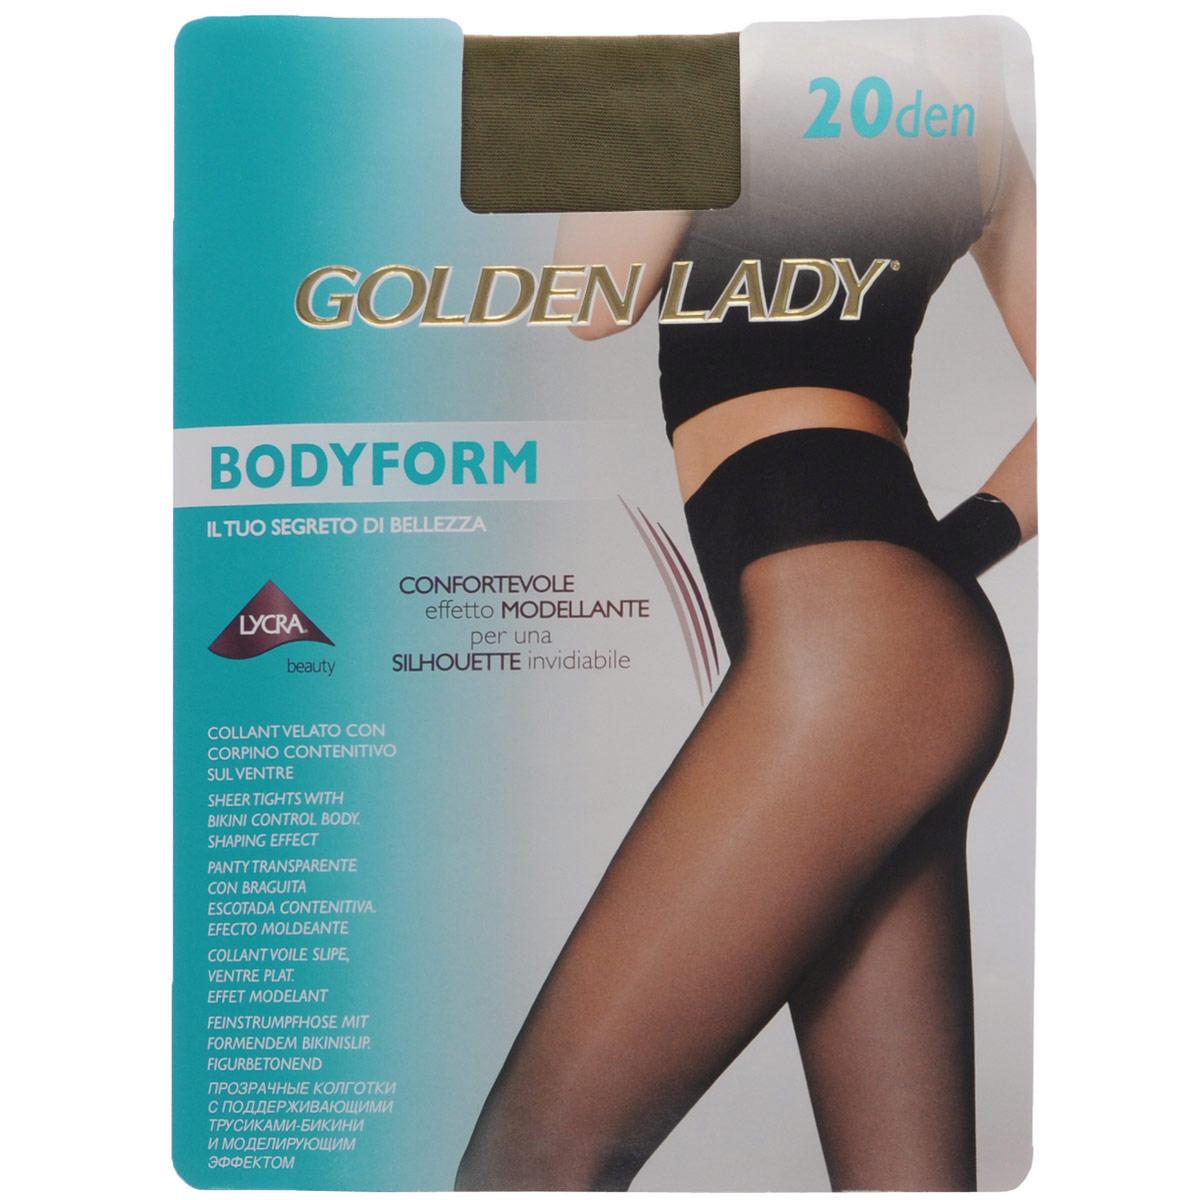 Колготки женские Golden Lady Bodyform 20, цвет: Daino (бледно-коричневый). 39NVN. Размер 3 (M) цены онлайн